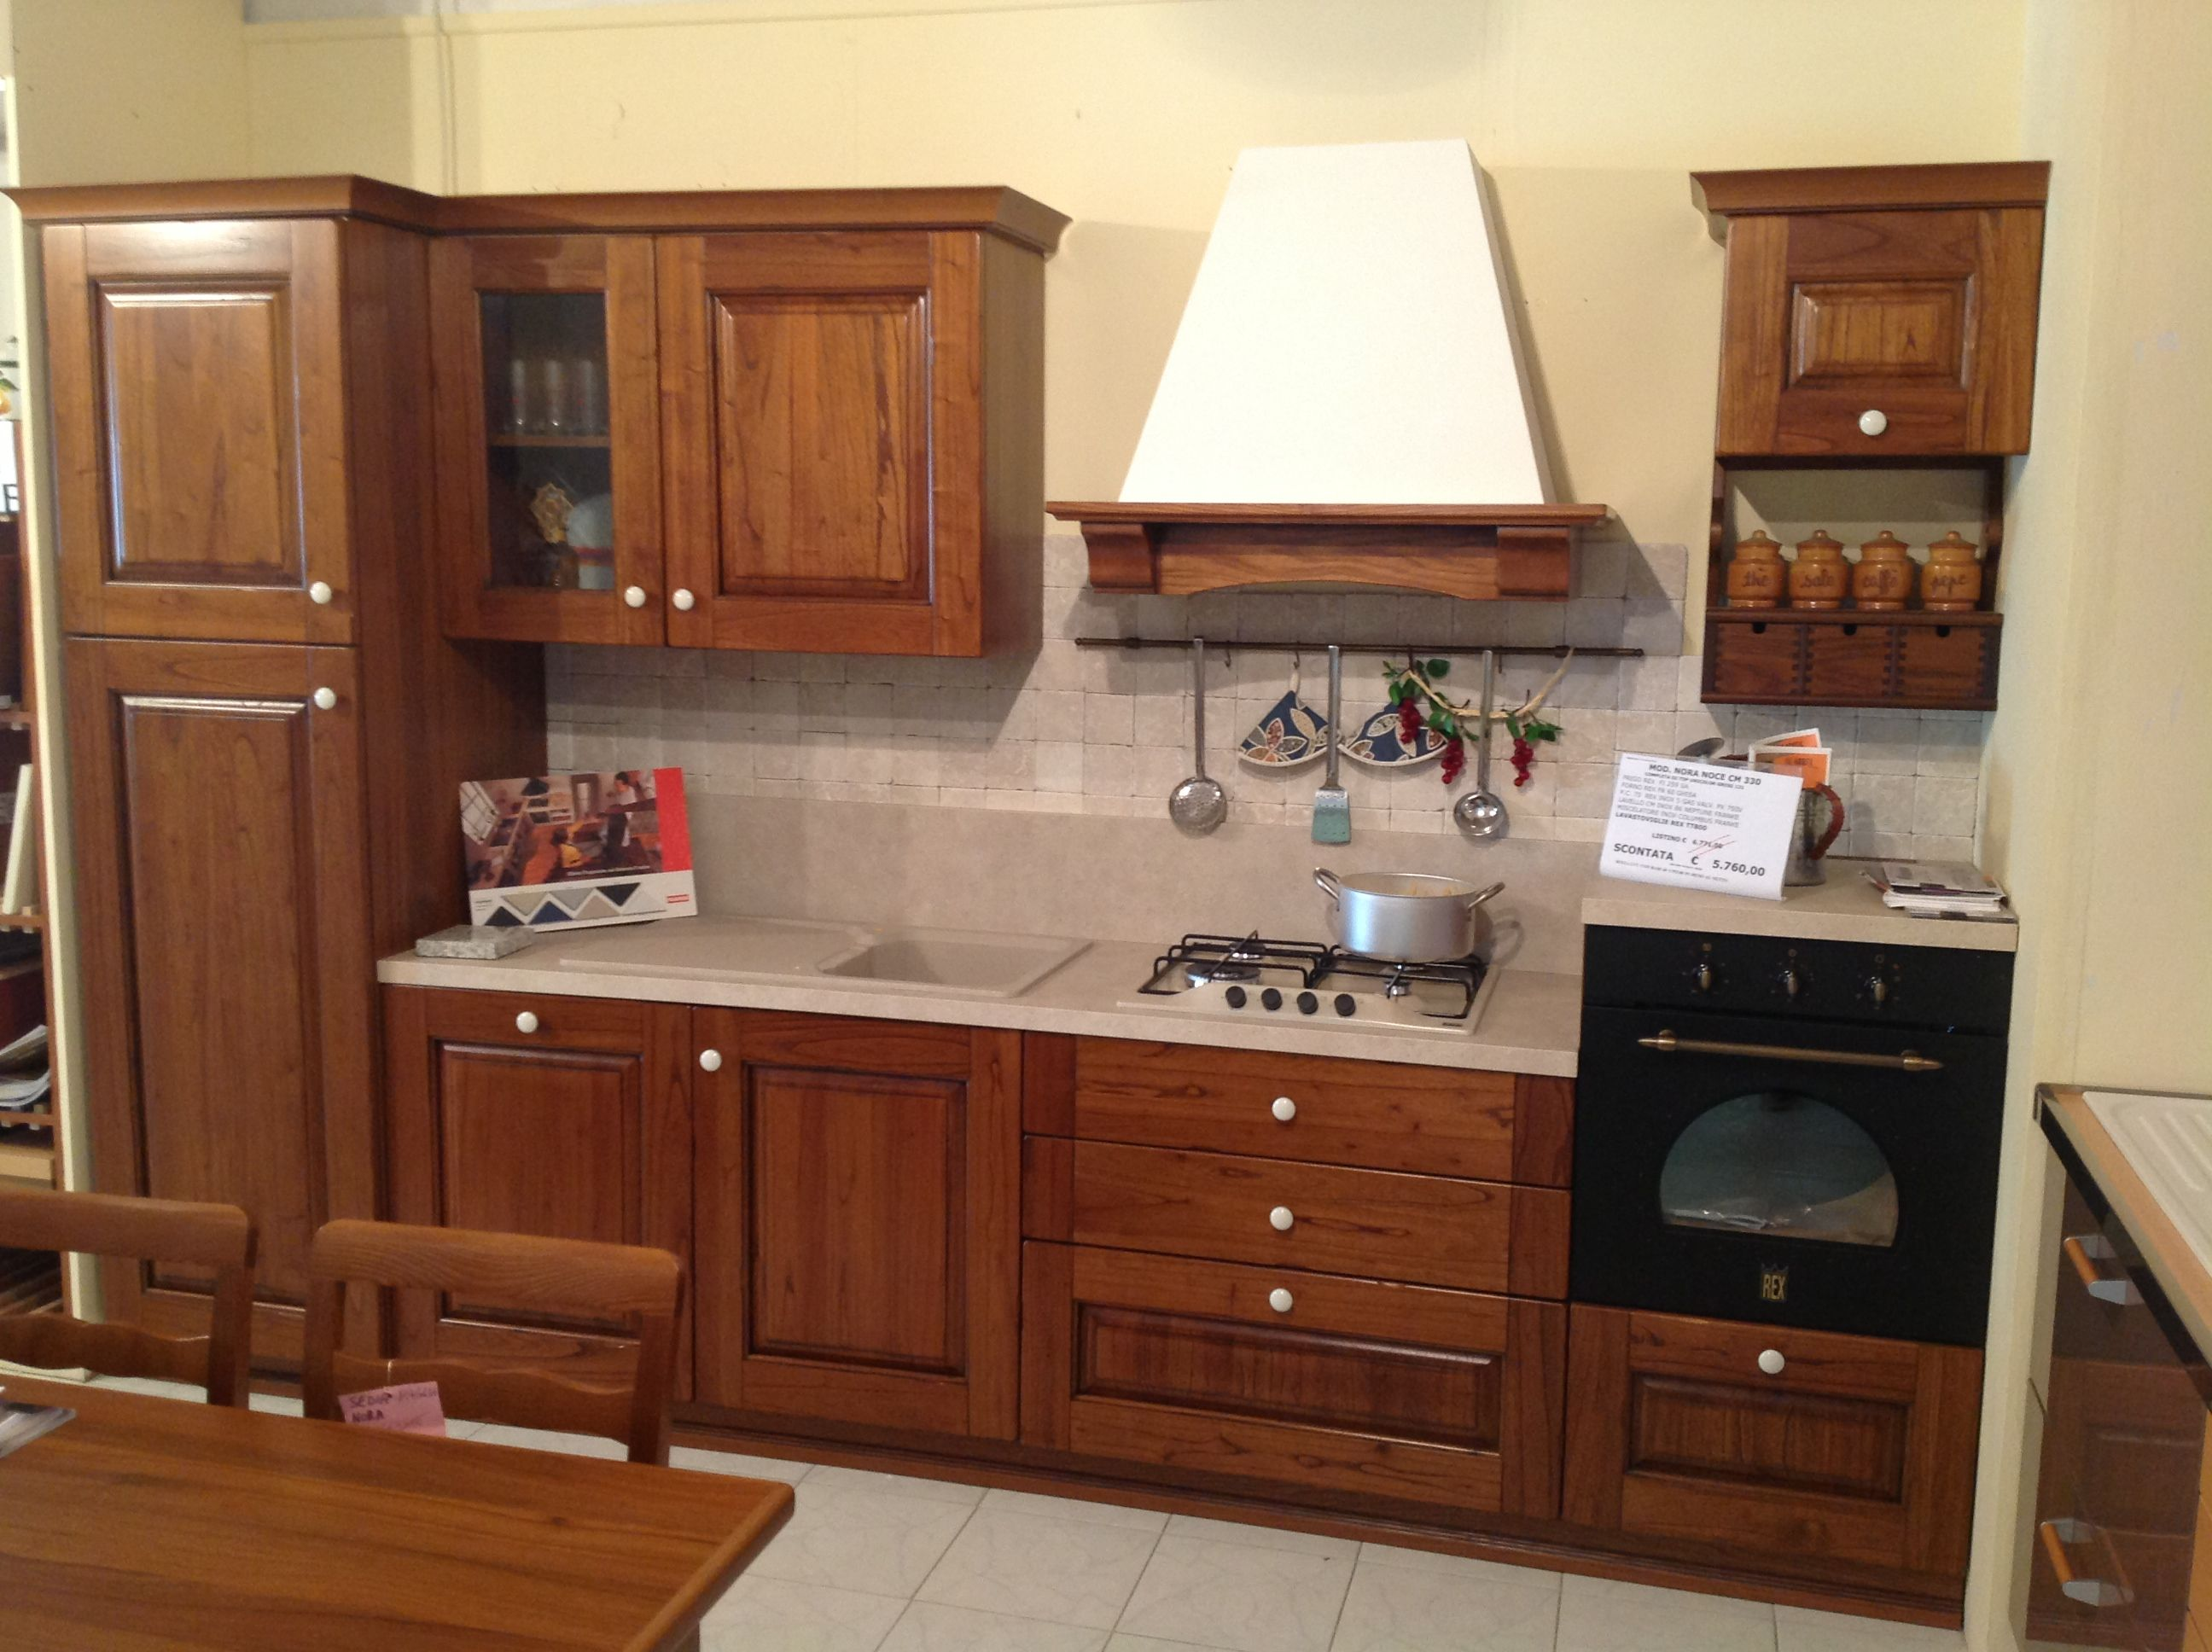 Arrex le cucine propone Nora, una cucina componibile classica in ...